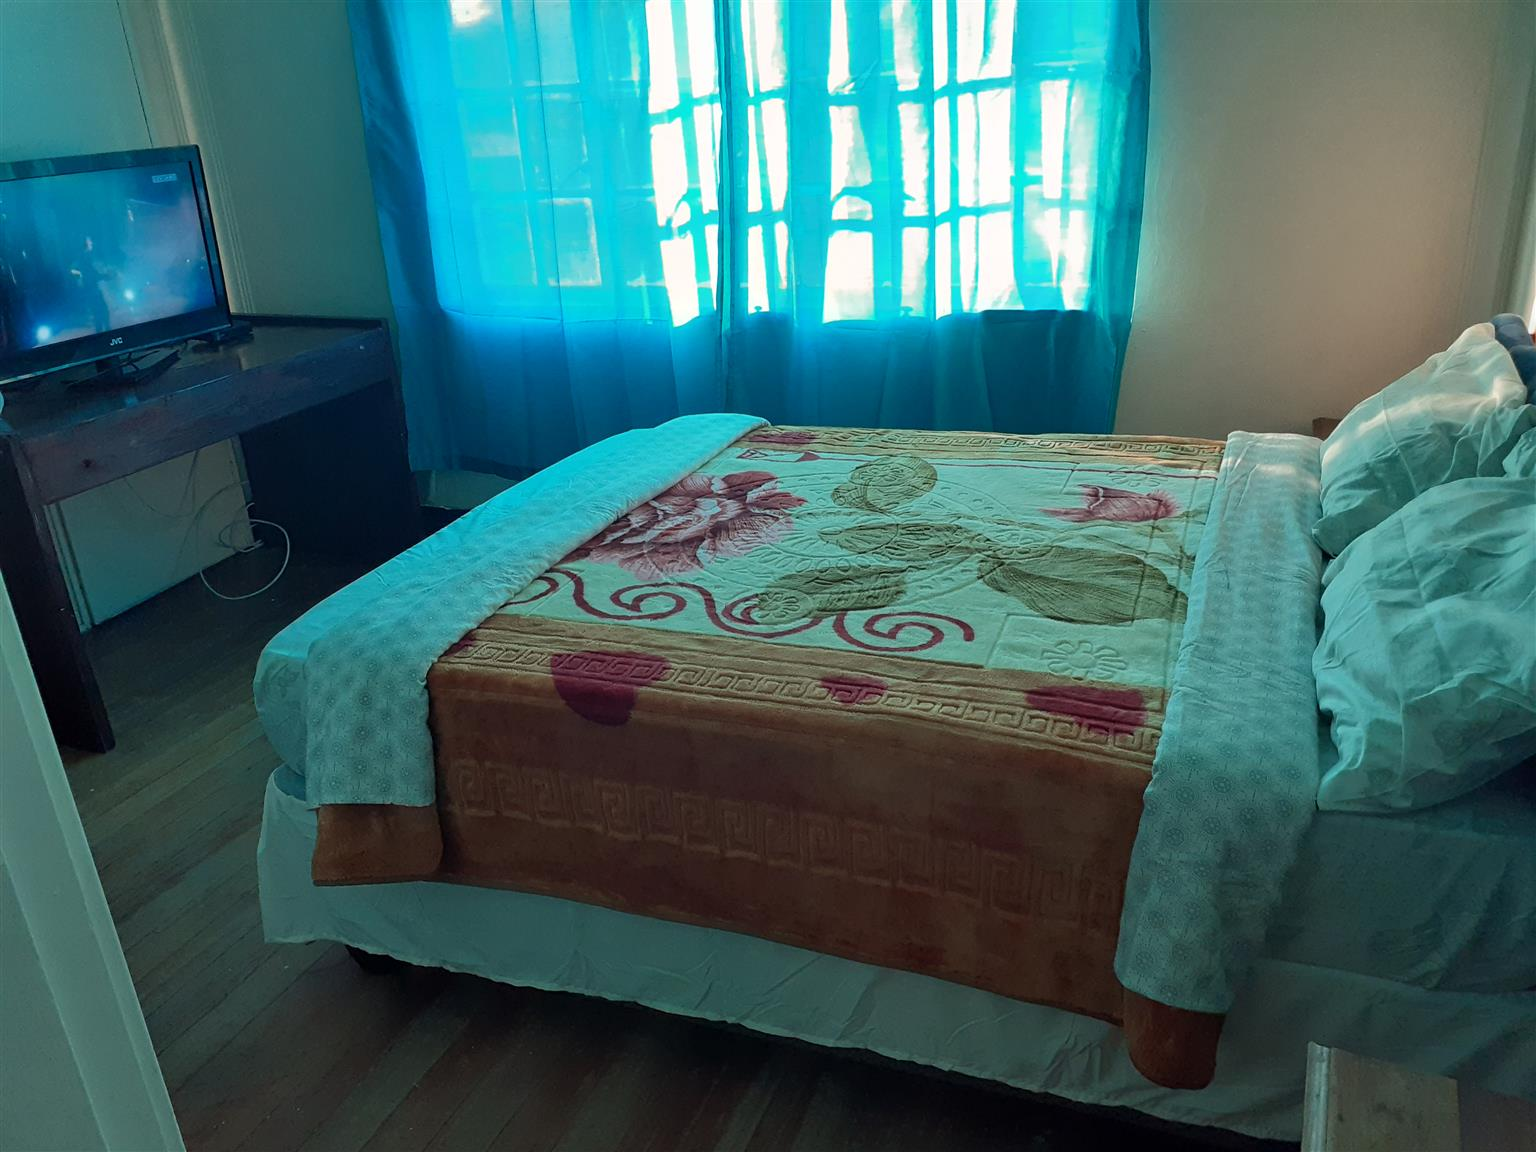 Salvador Guest House vereeniging 0848103487 R200 a night